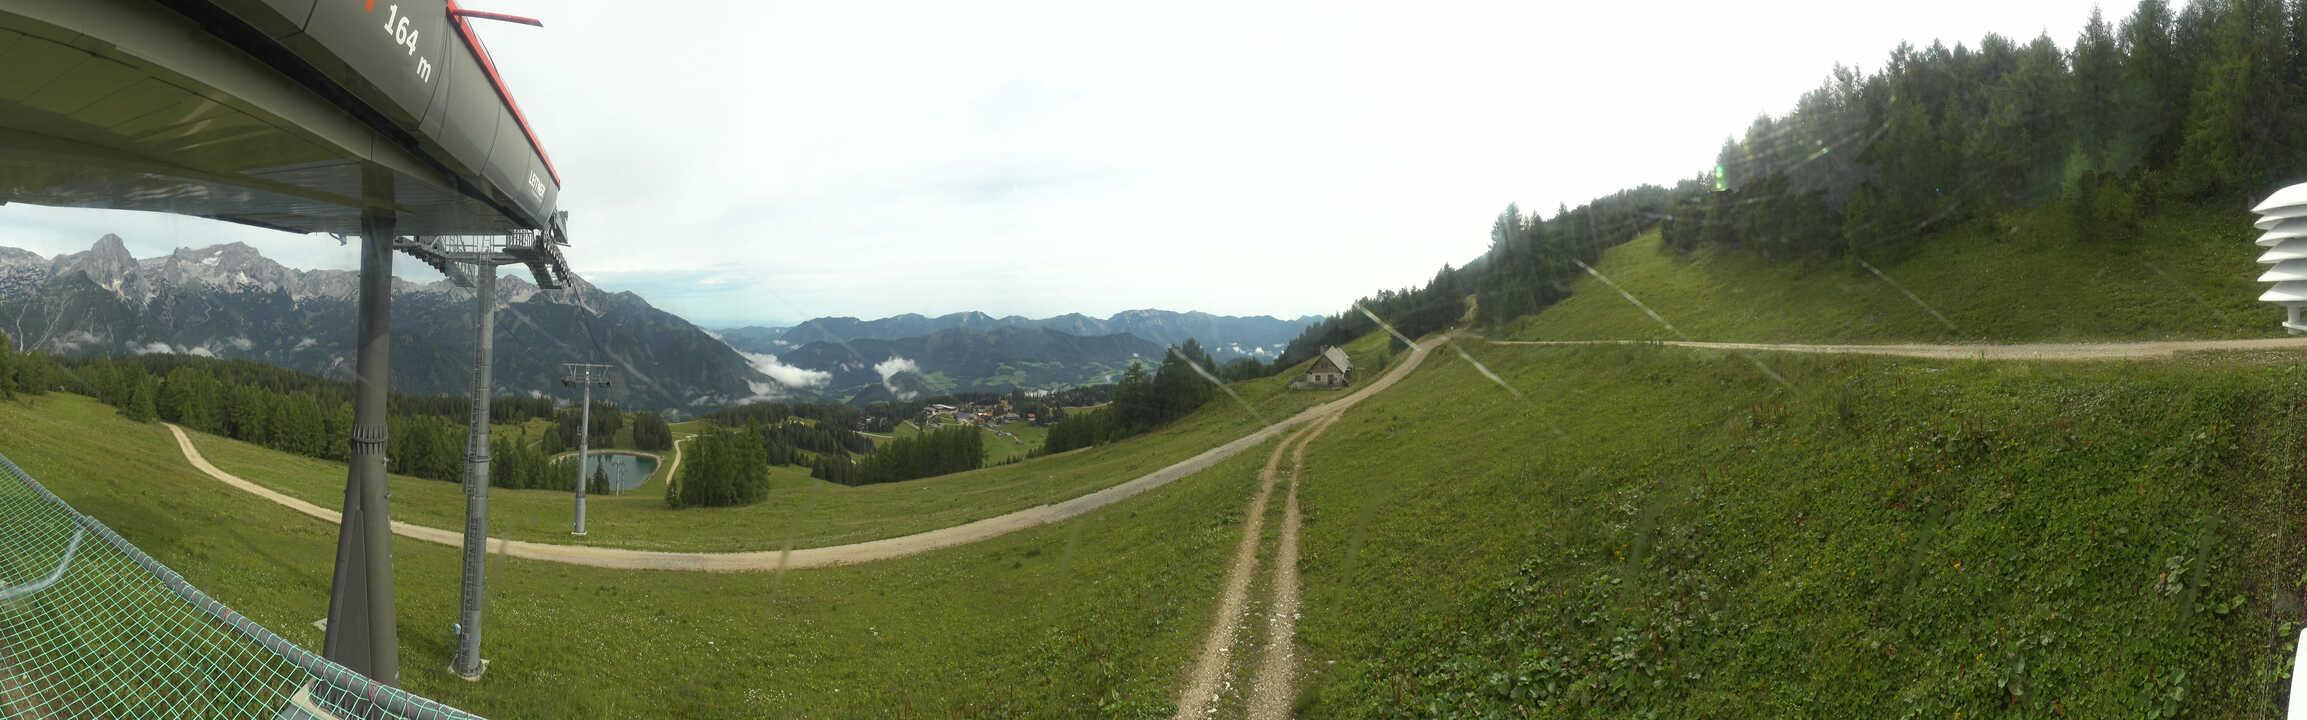 Hintersdoter webcam - Hirschkogel top ski station